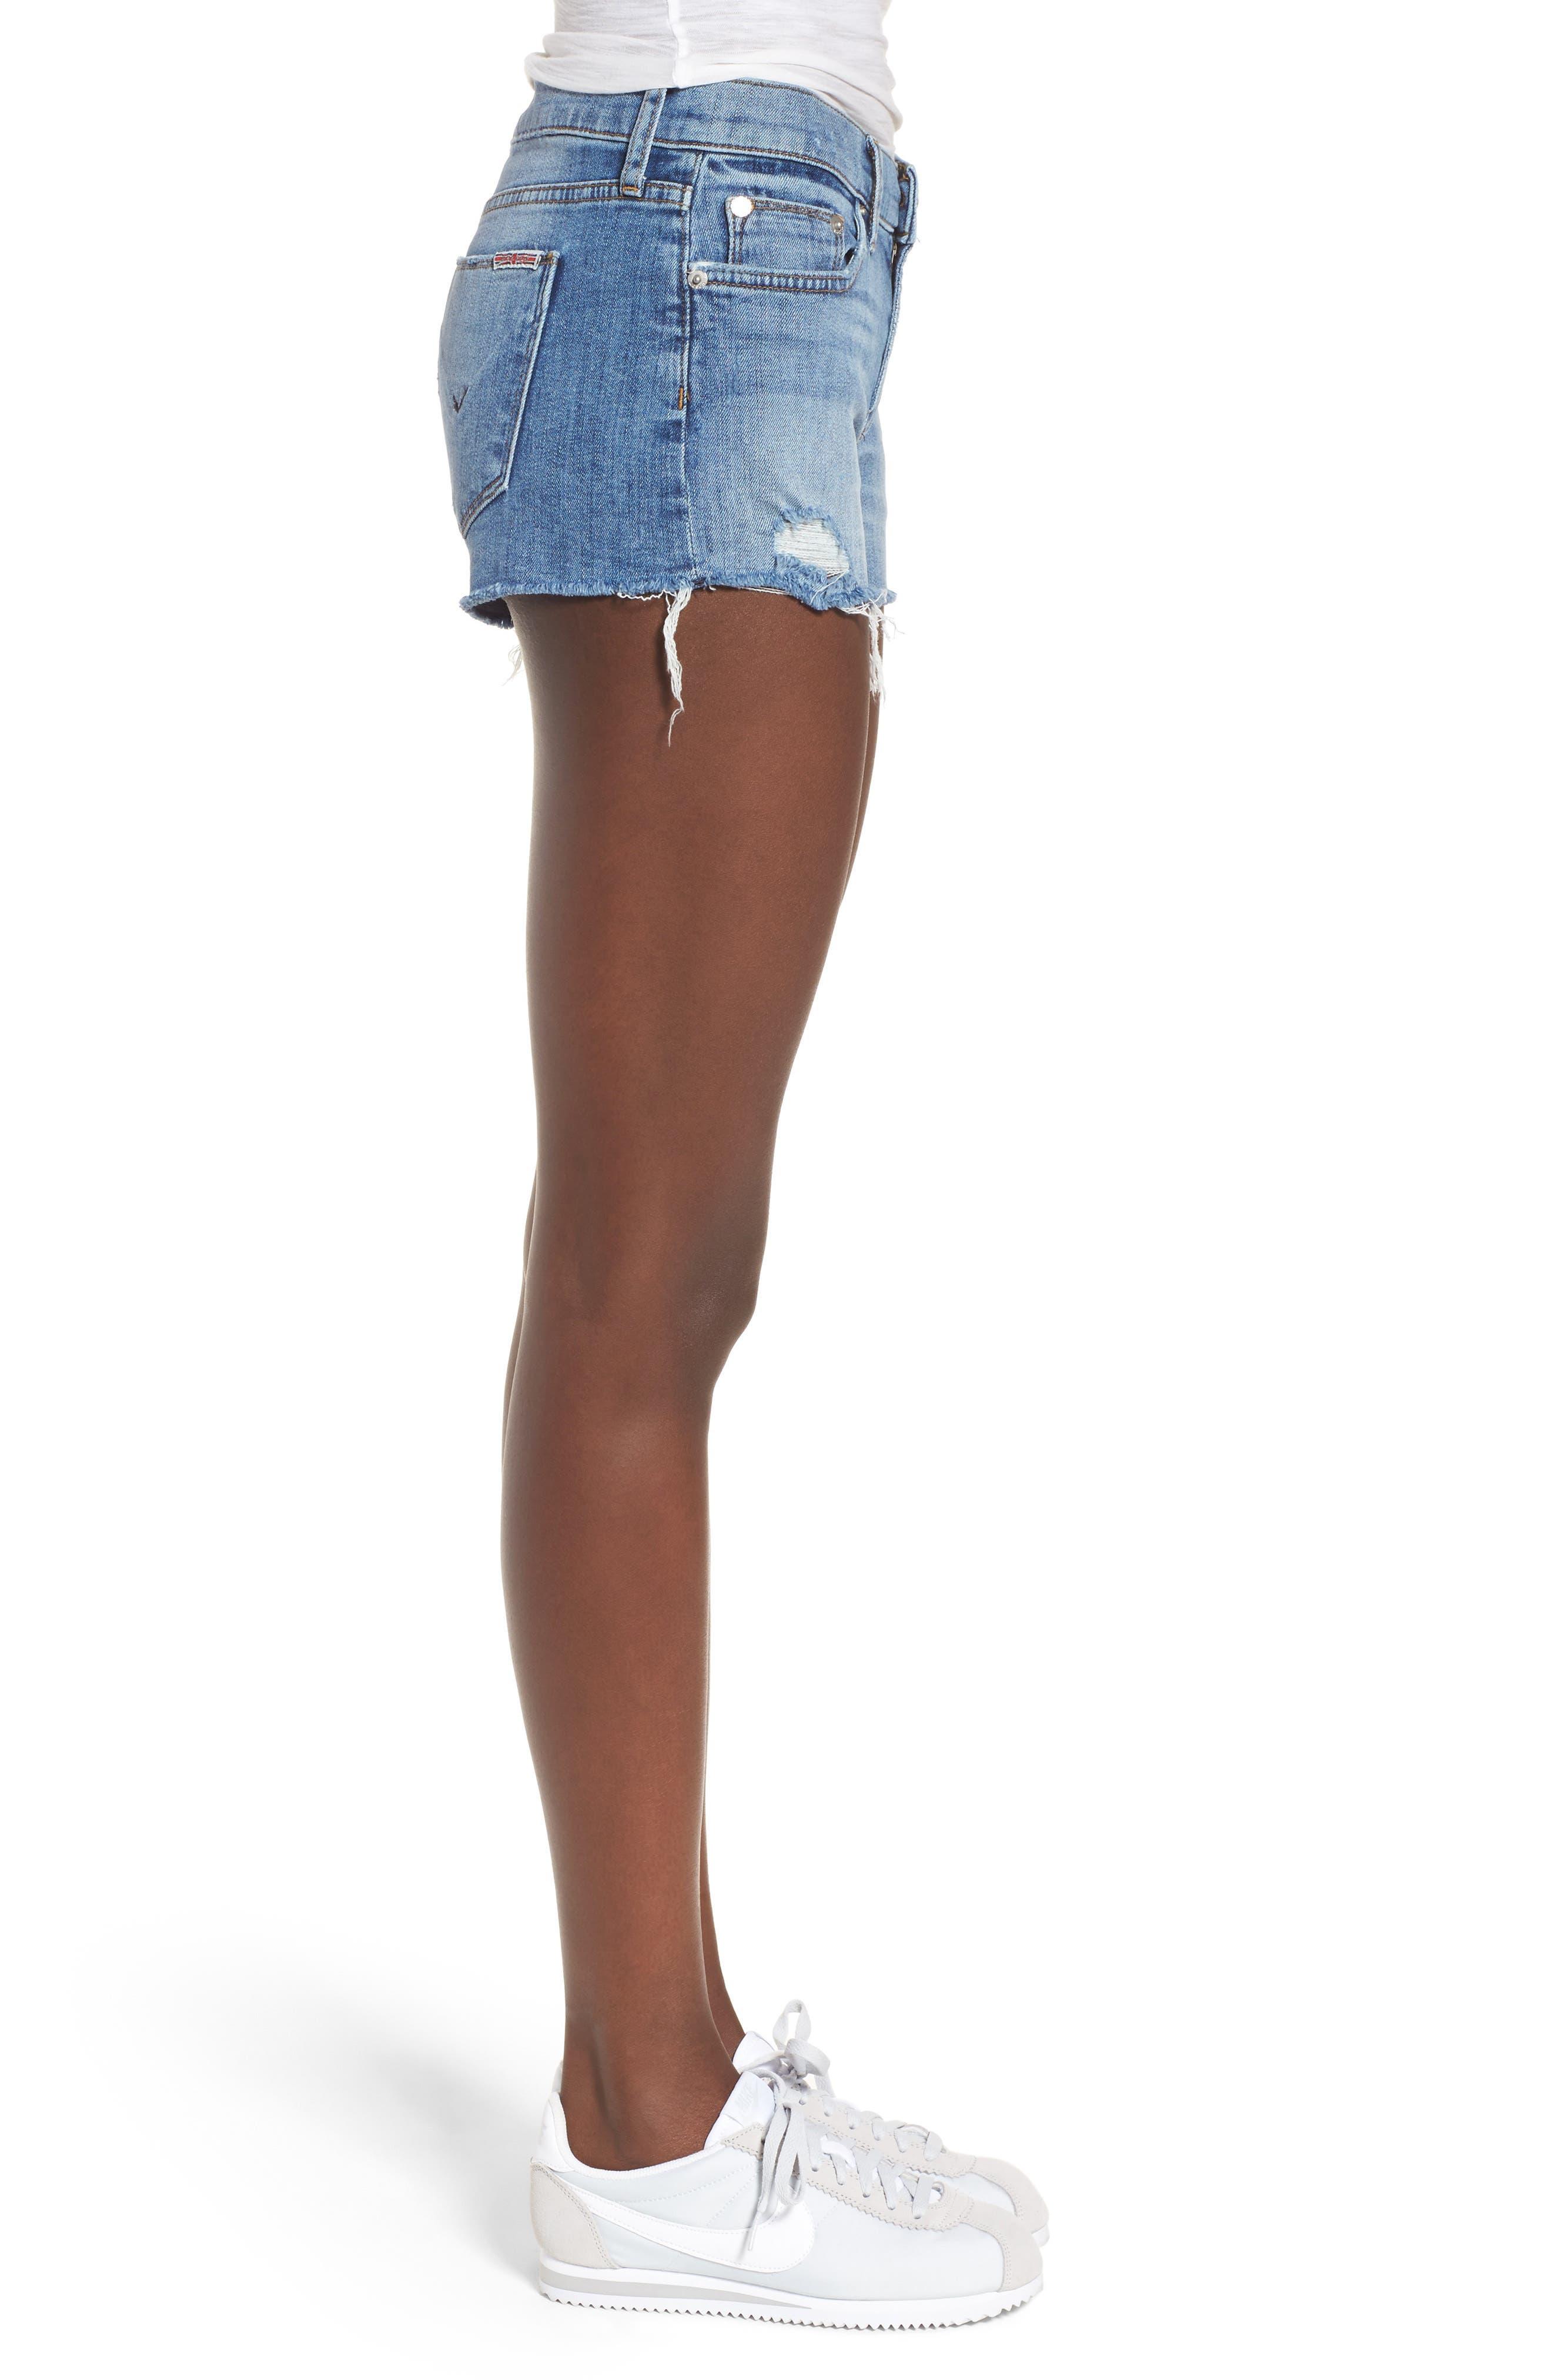 Kenzie Cutoff Denim Shorts,                             Alternate thumbnail 3, color,                             420